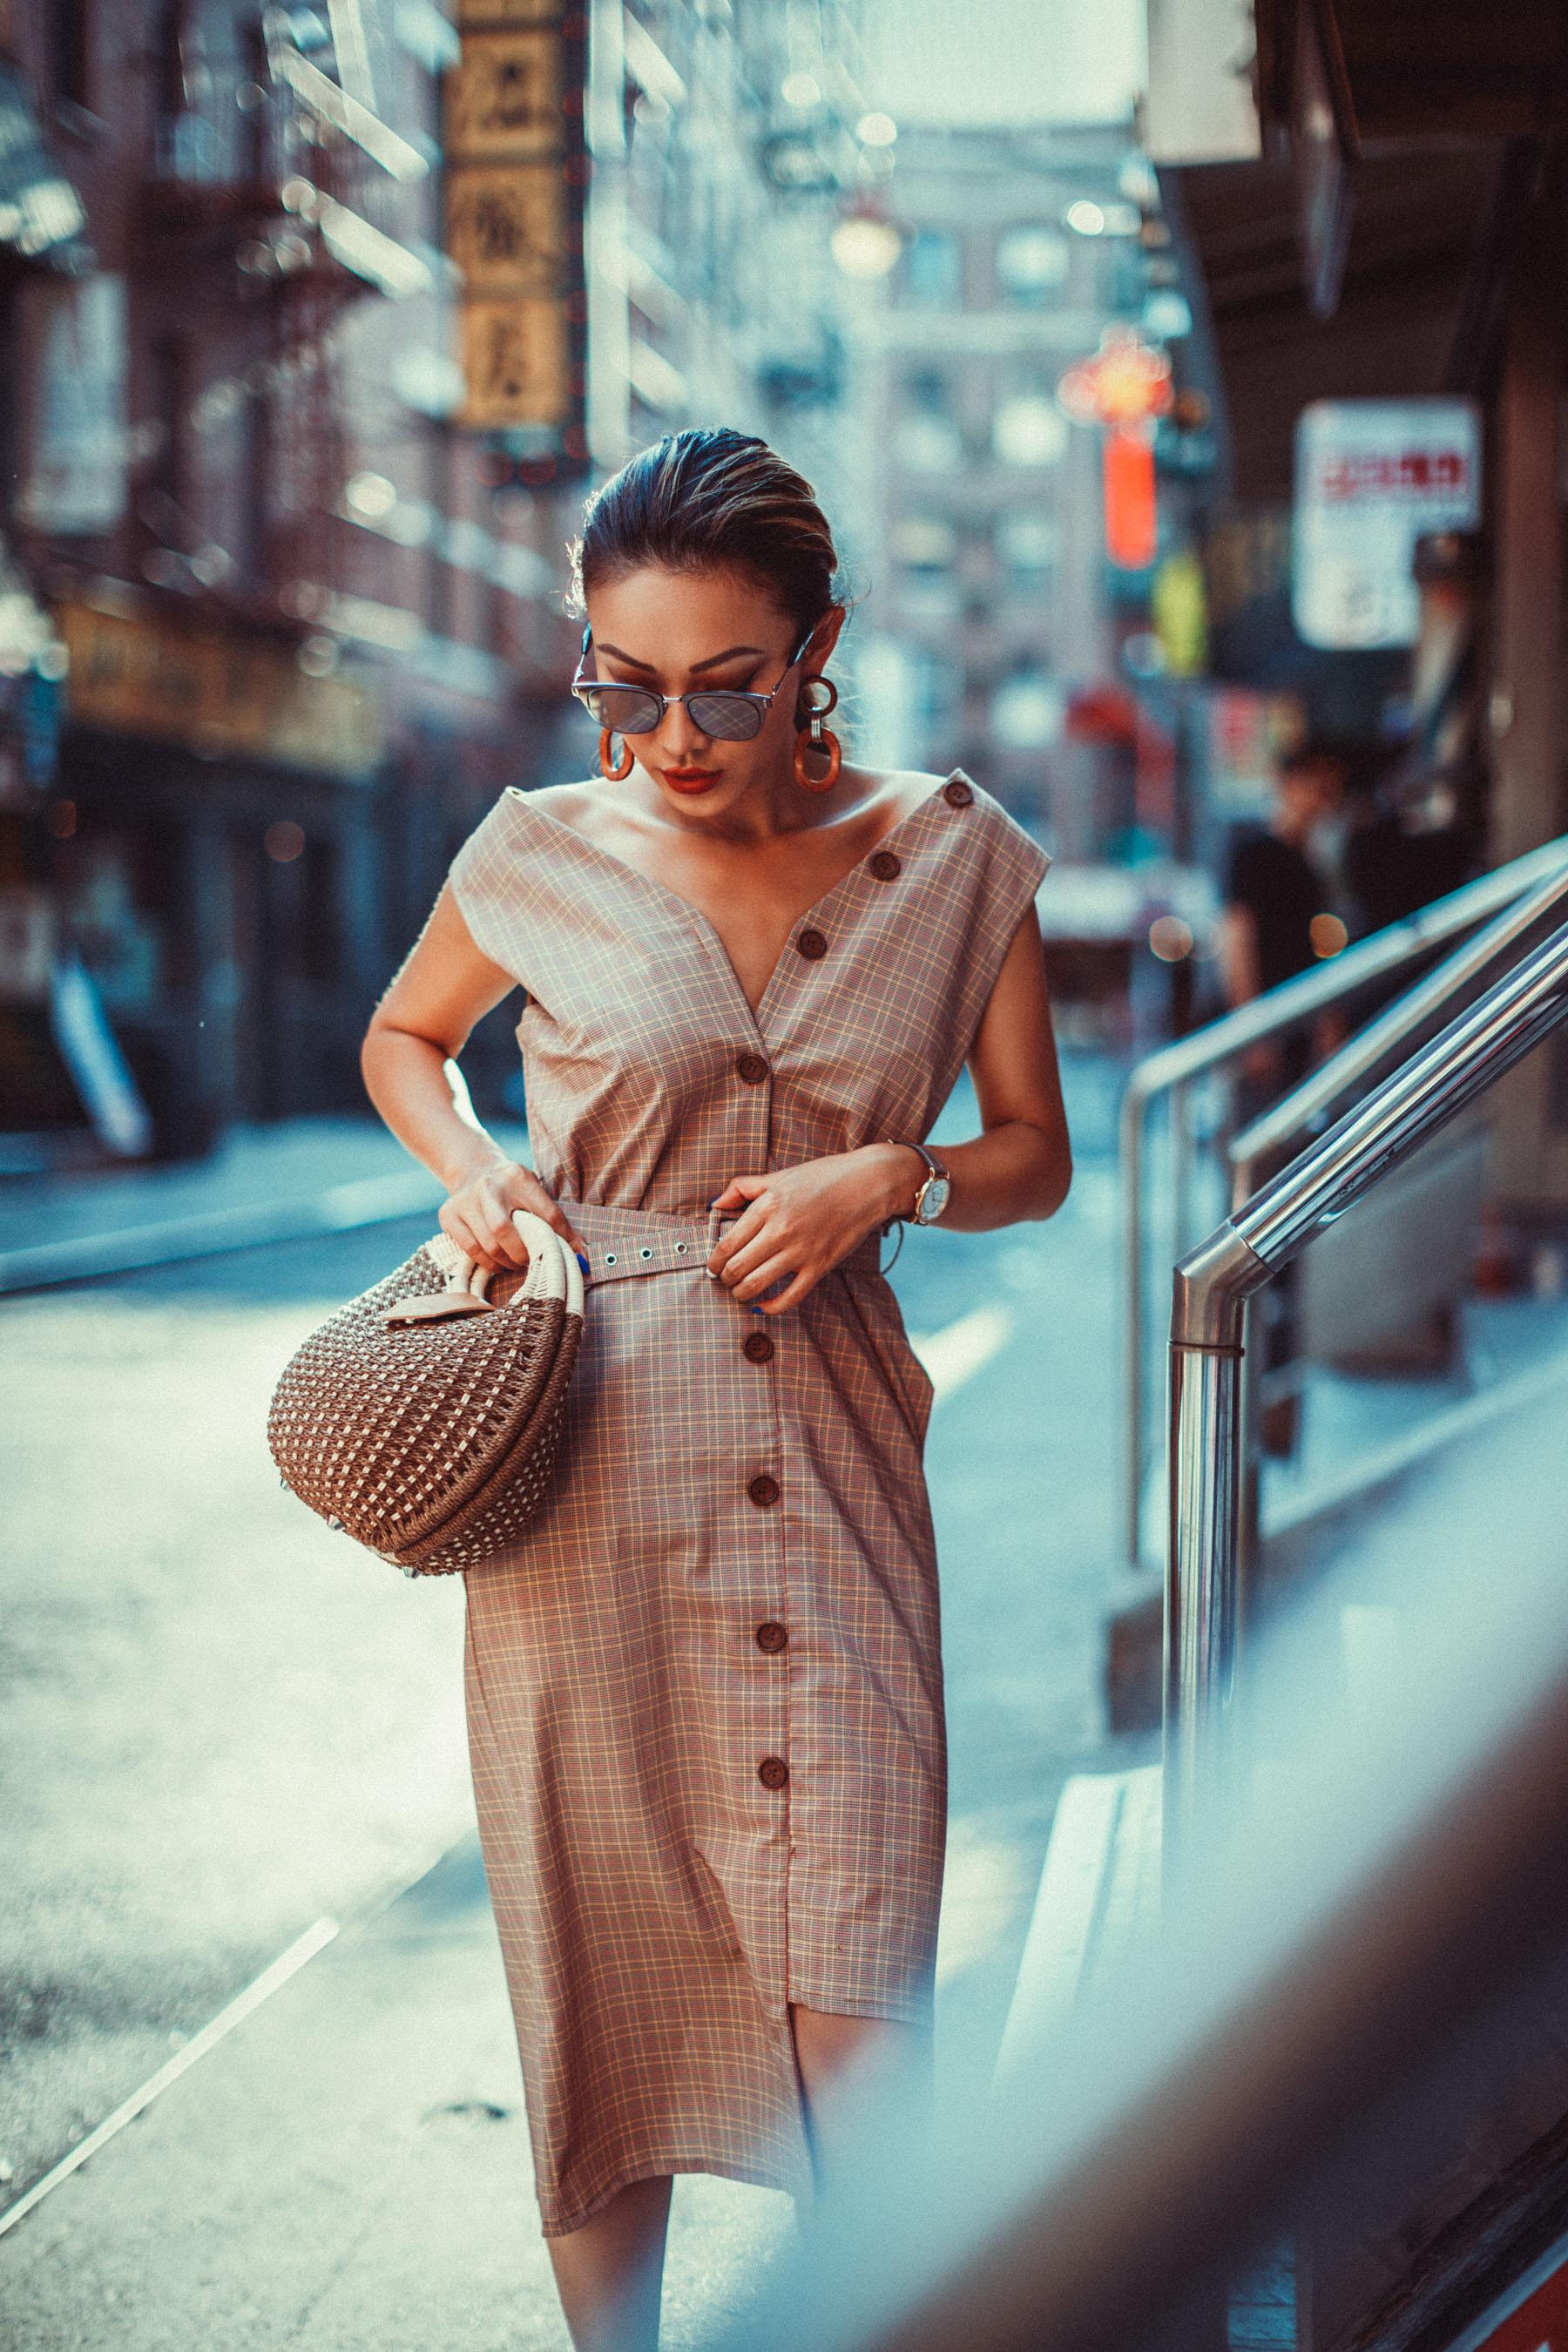 vintage trends 2017 vintage inspired trends for fall 2017 ...